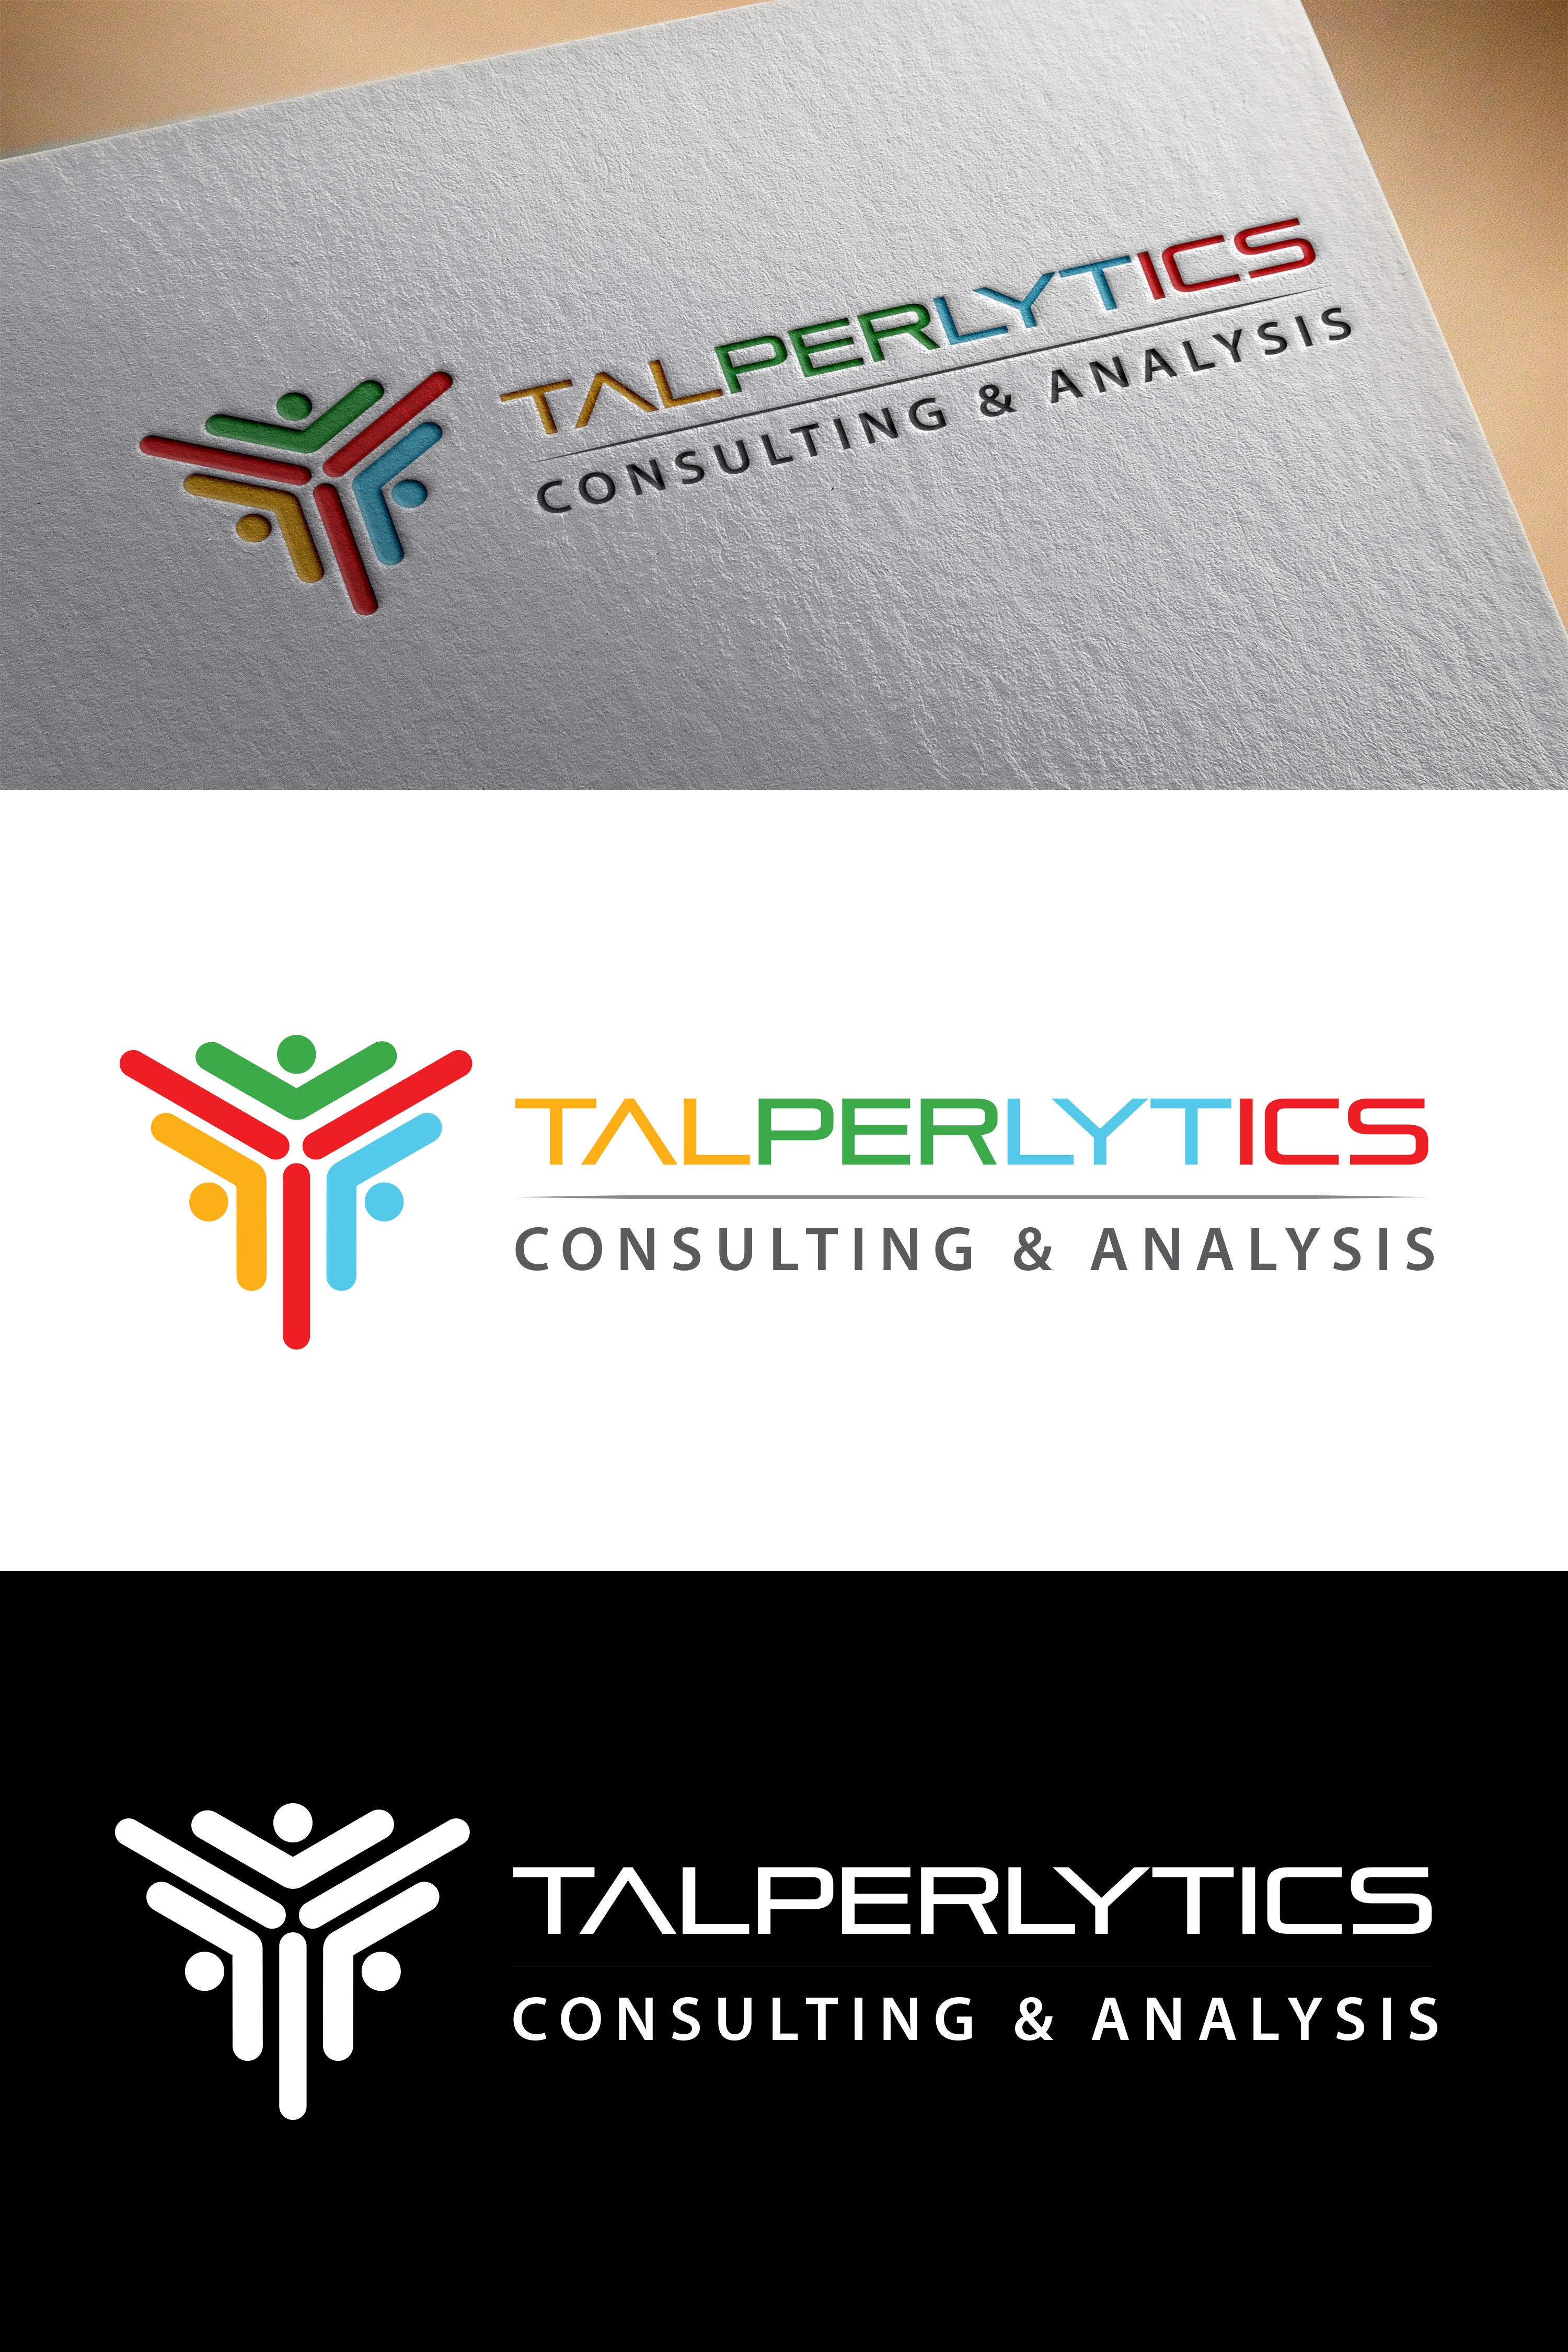 Logo Design by Umair ahmed Iqbal - Entry No. 50 in the Logo Design Contest Imaginative Logo Design for Talperlytics.